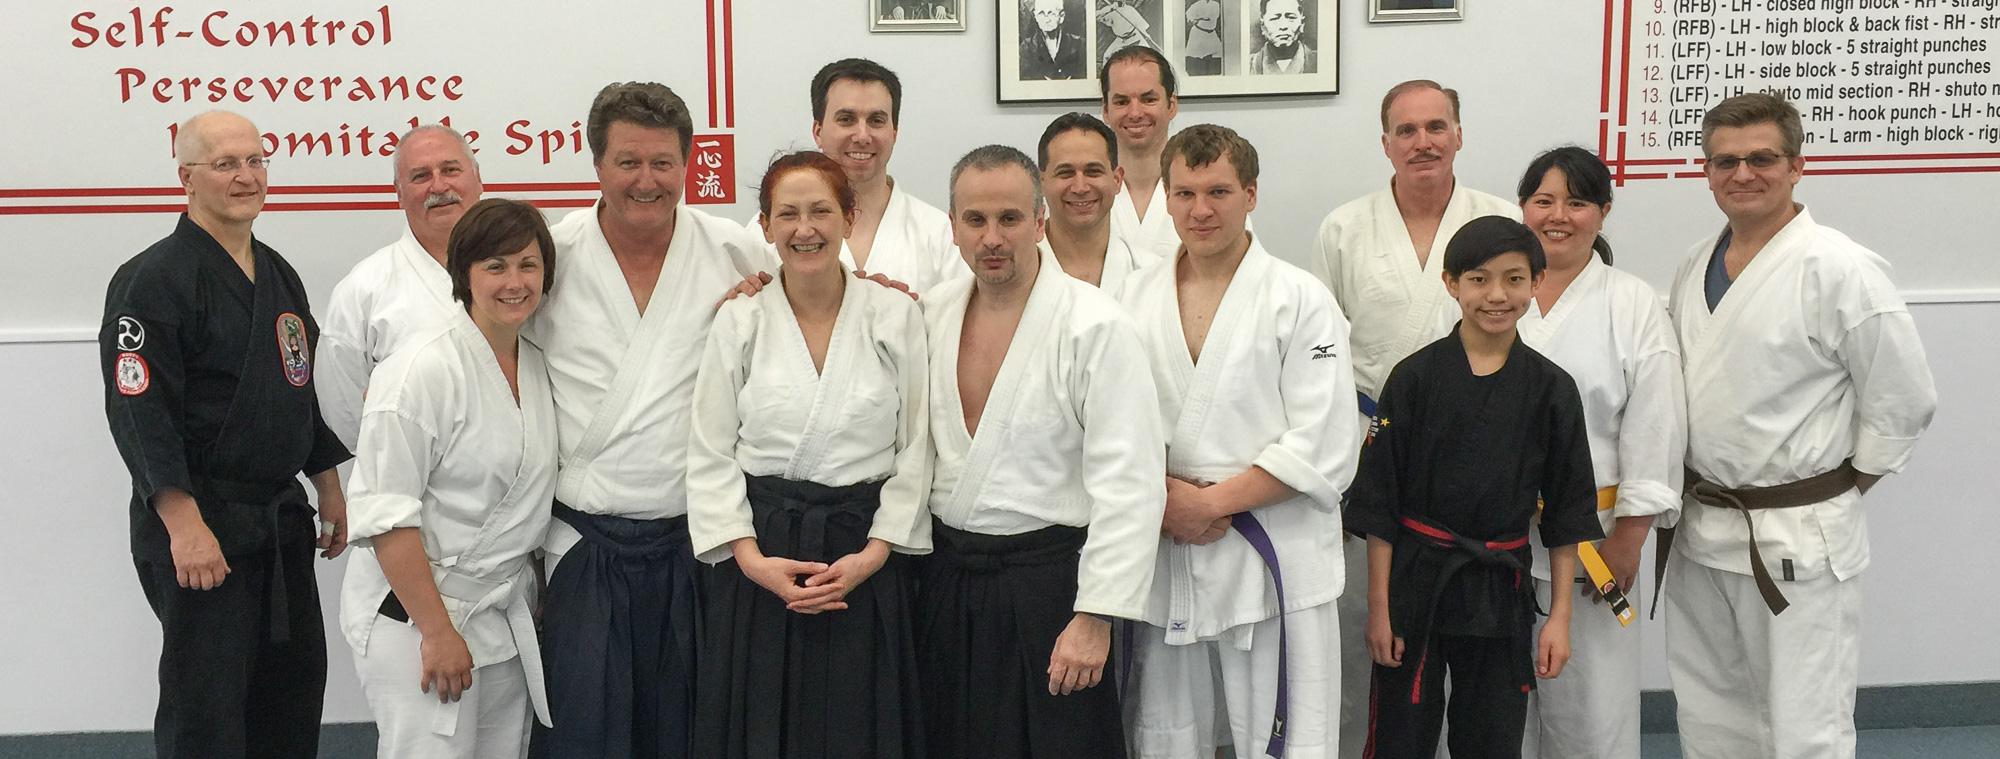 Image of Aikido class